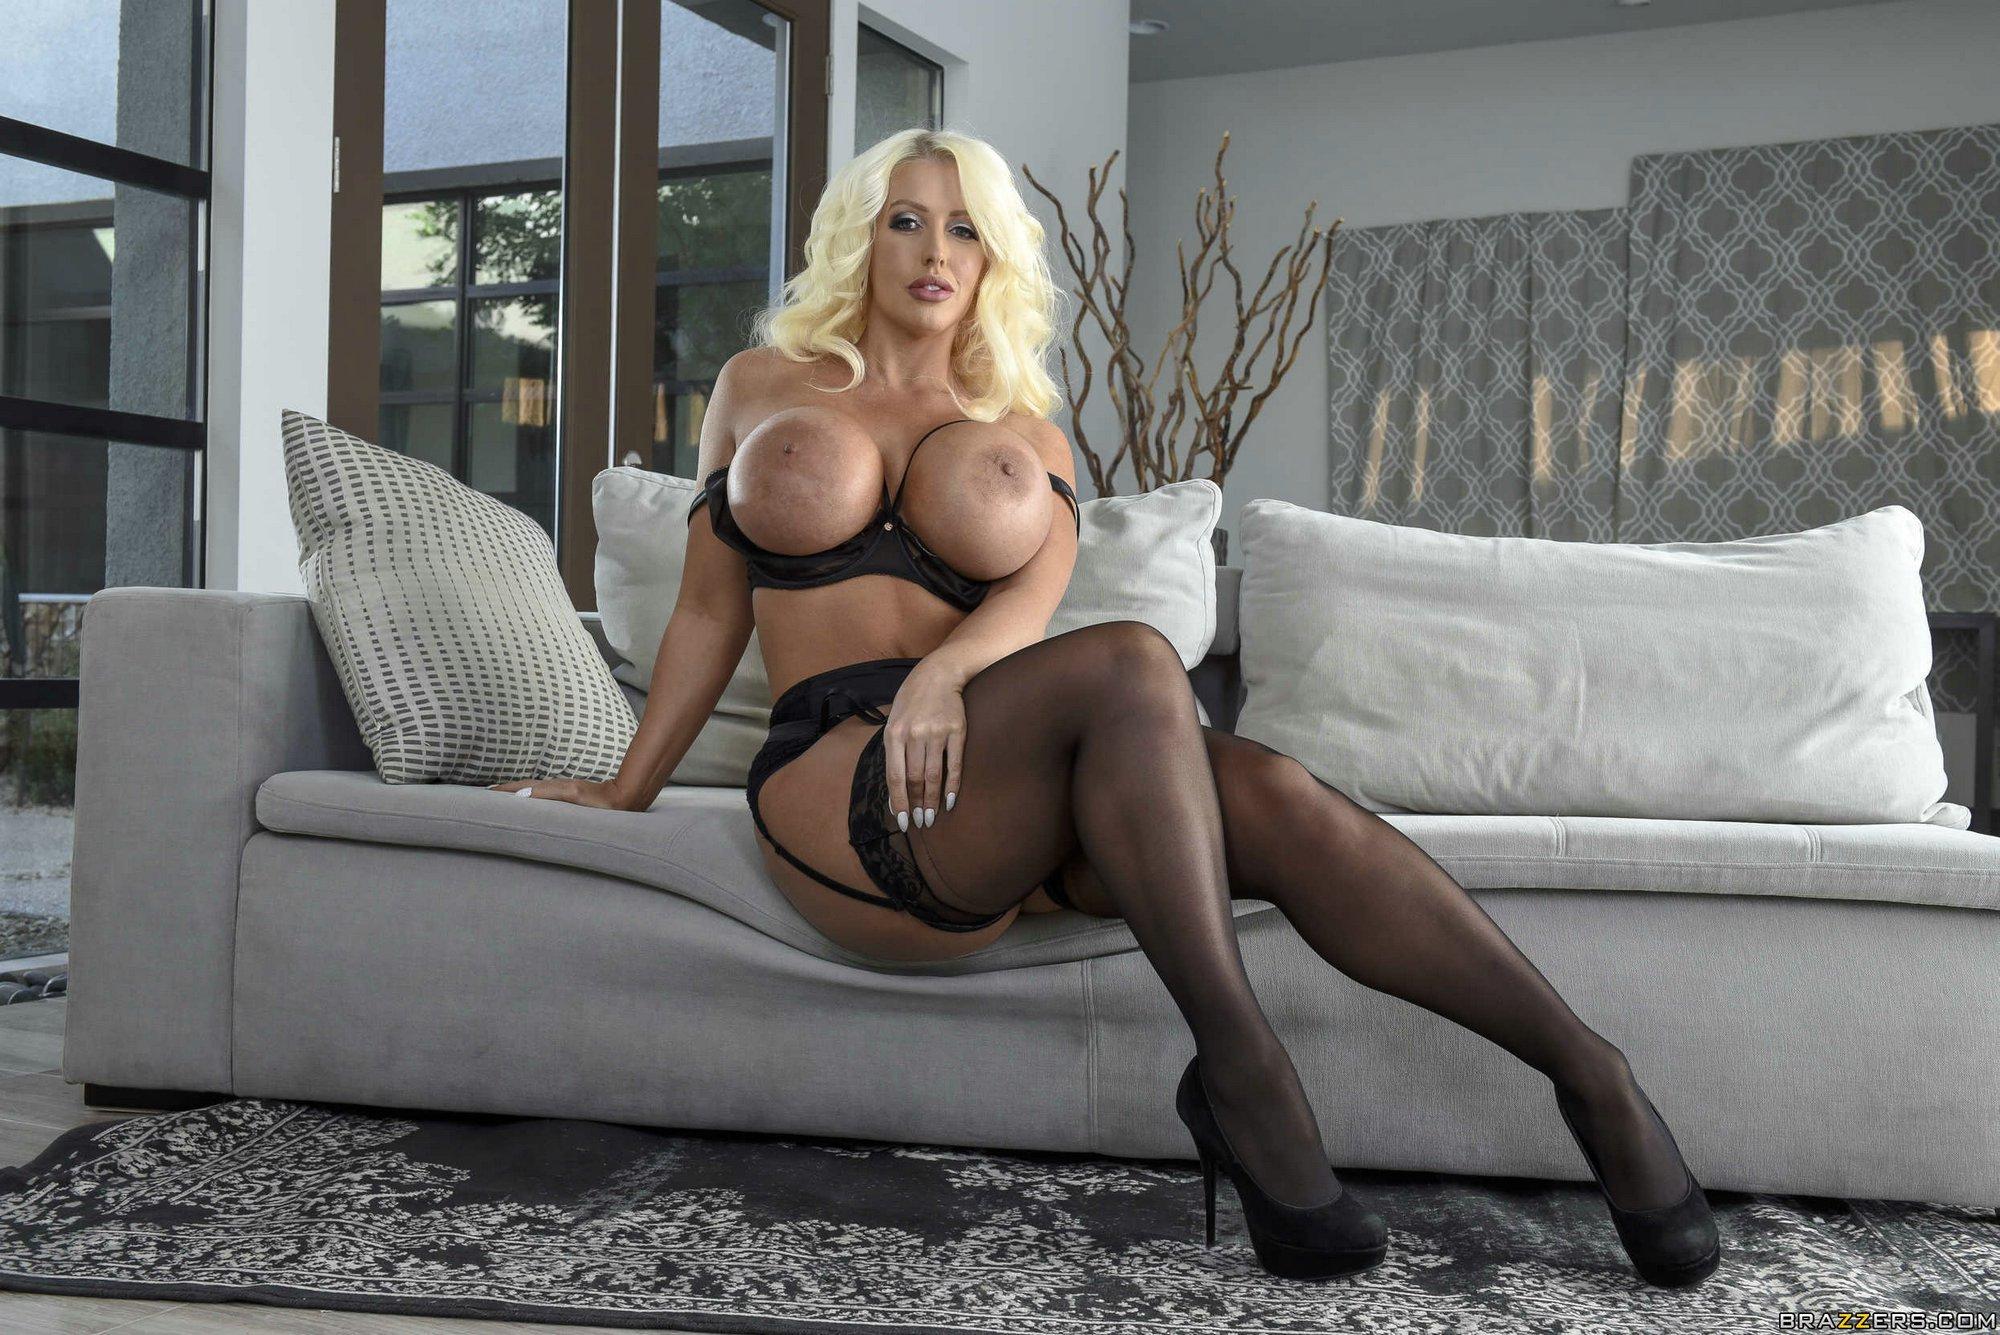 Angelique Pettyjohn Porn Movies angelique pettyjohn star | www.freee-porno